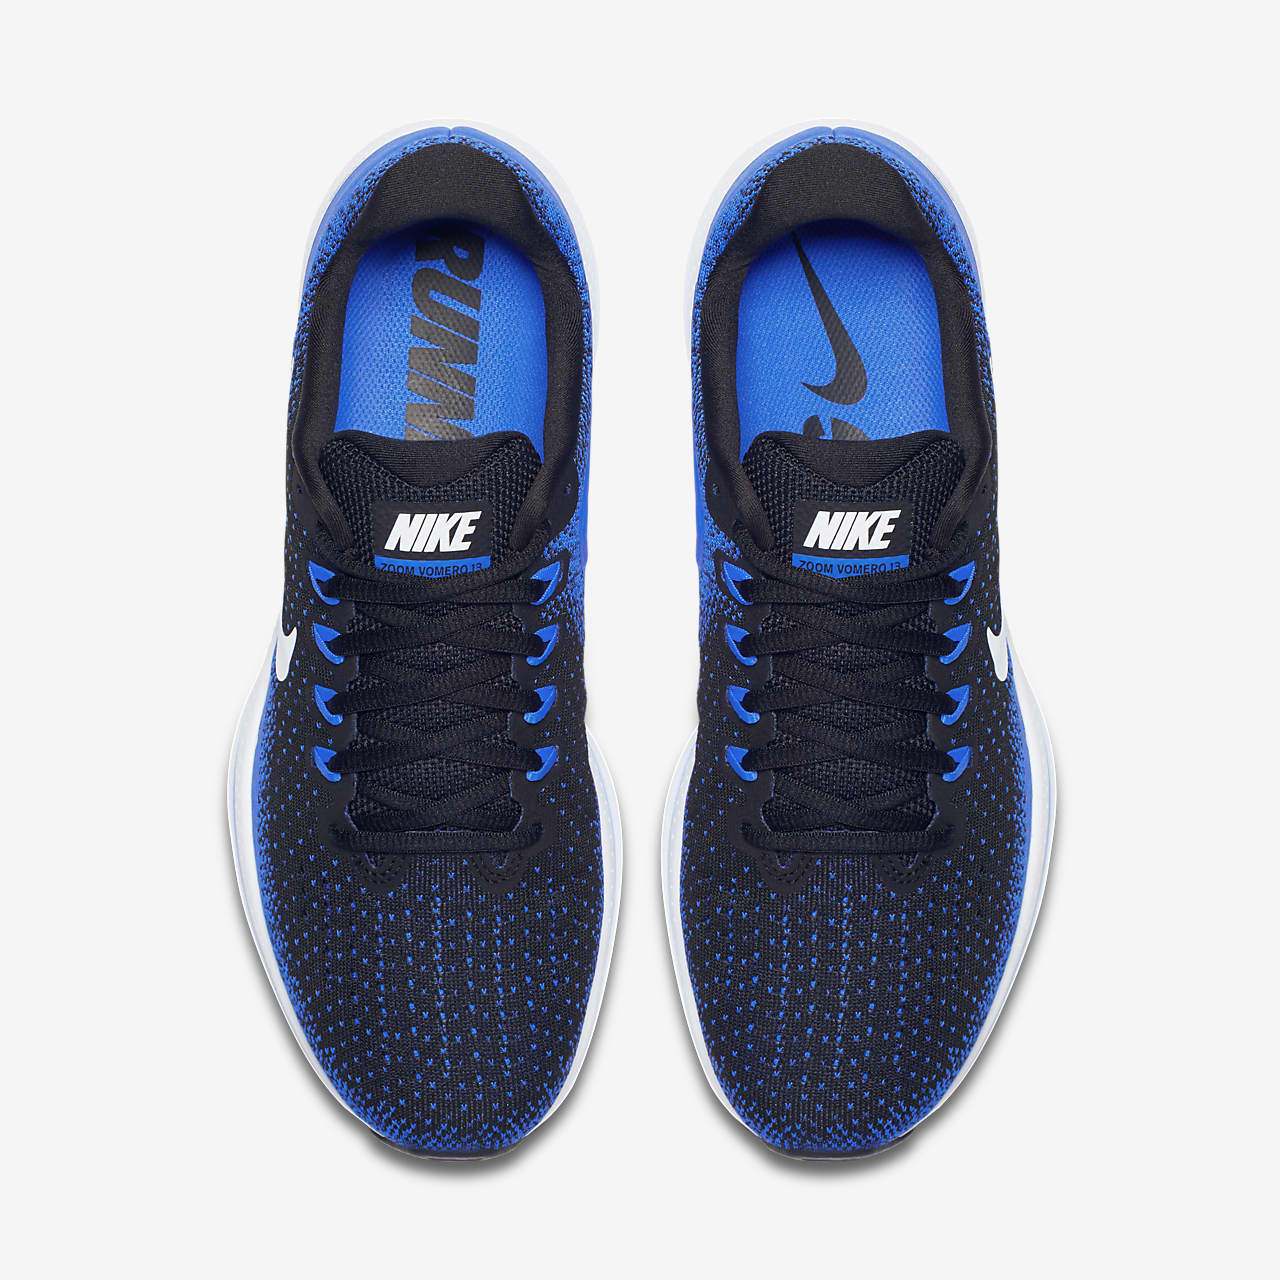 vomero 13 blue